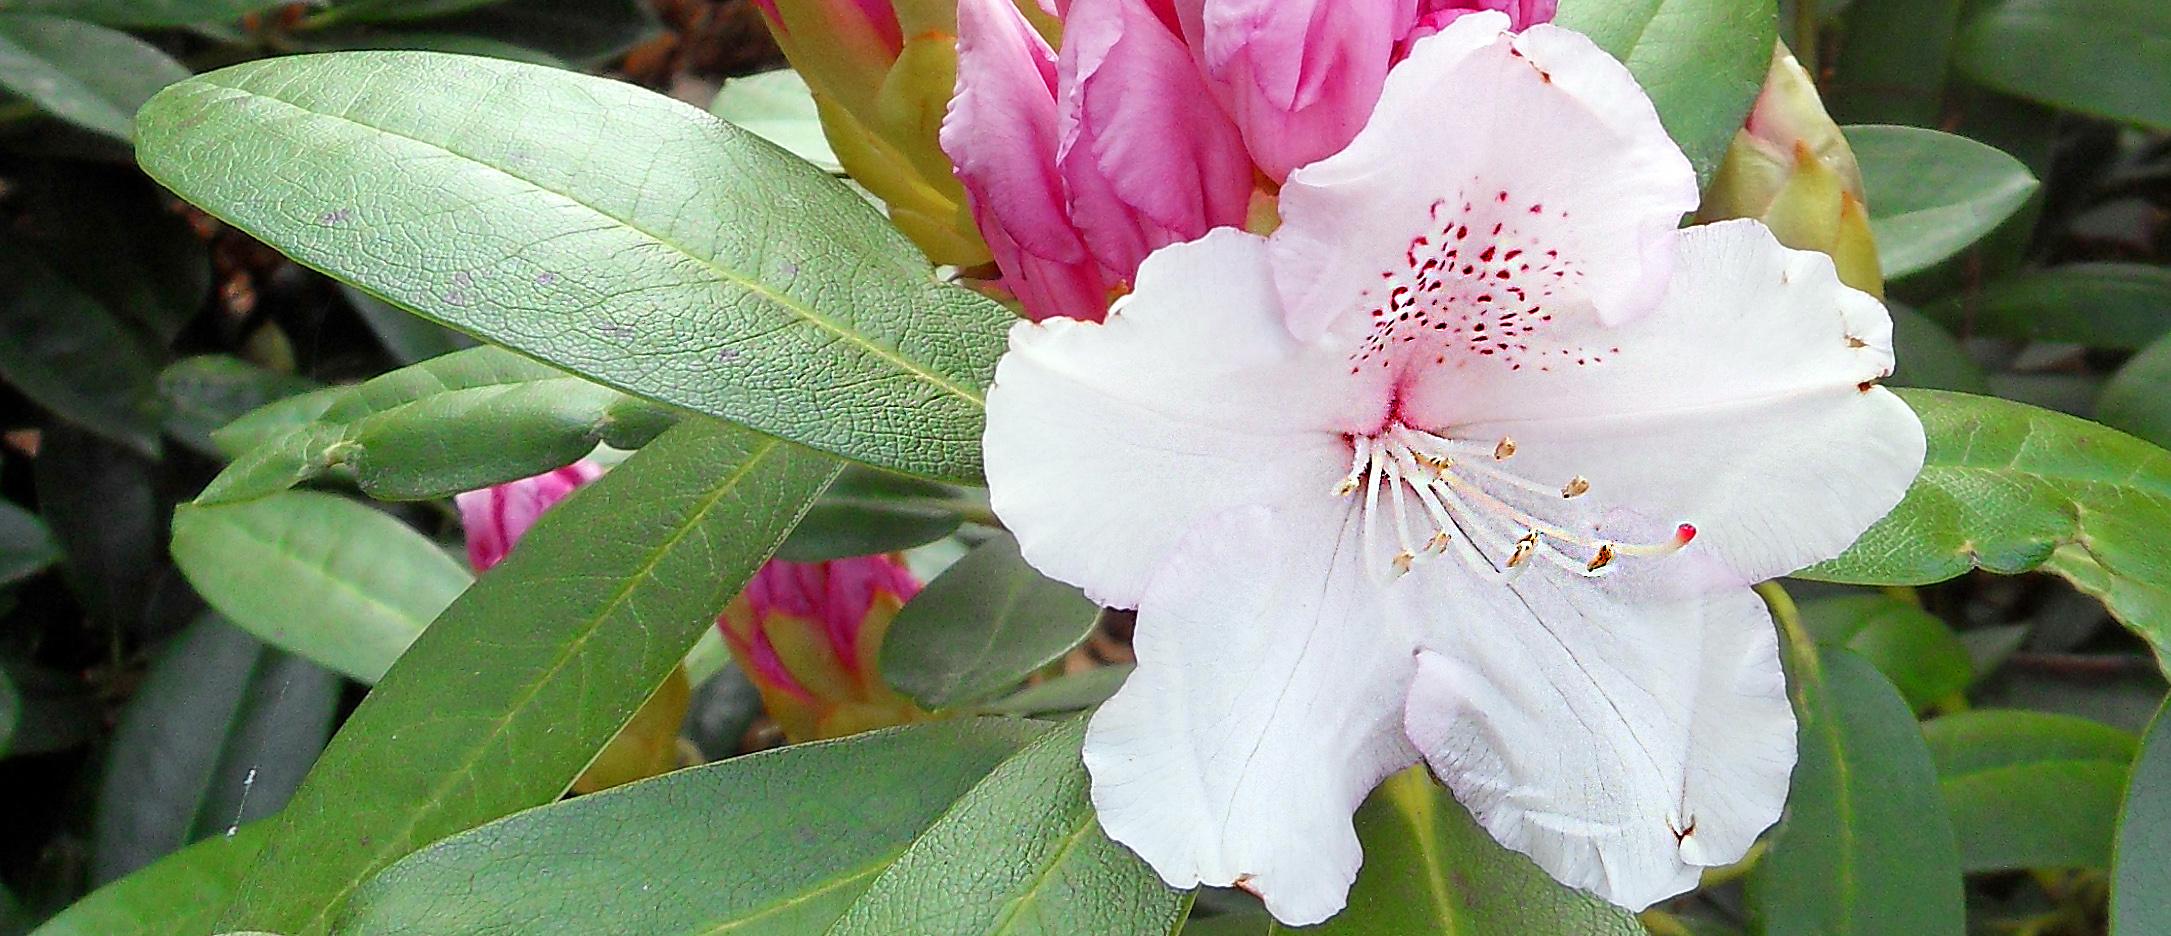 rhododendron_vit_rosa_mitt_900x388.jpg